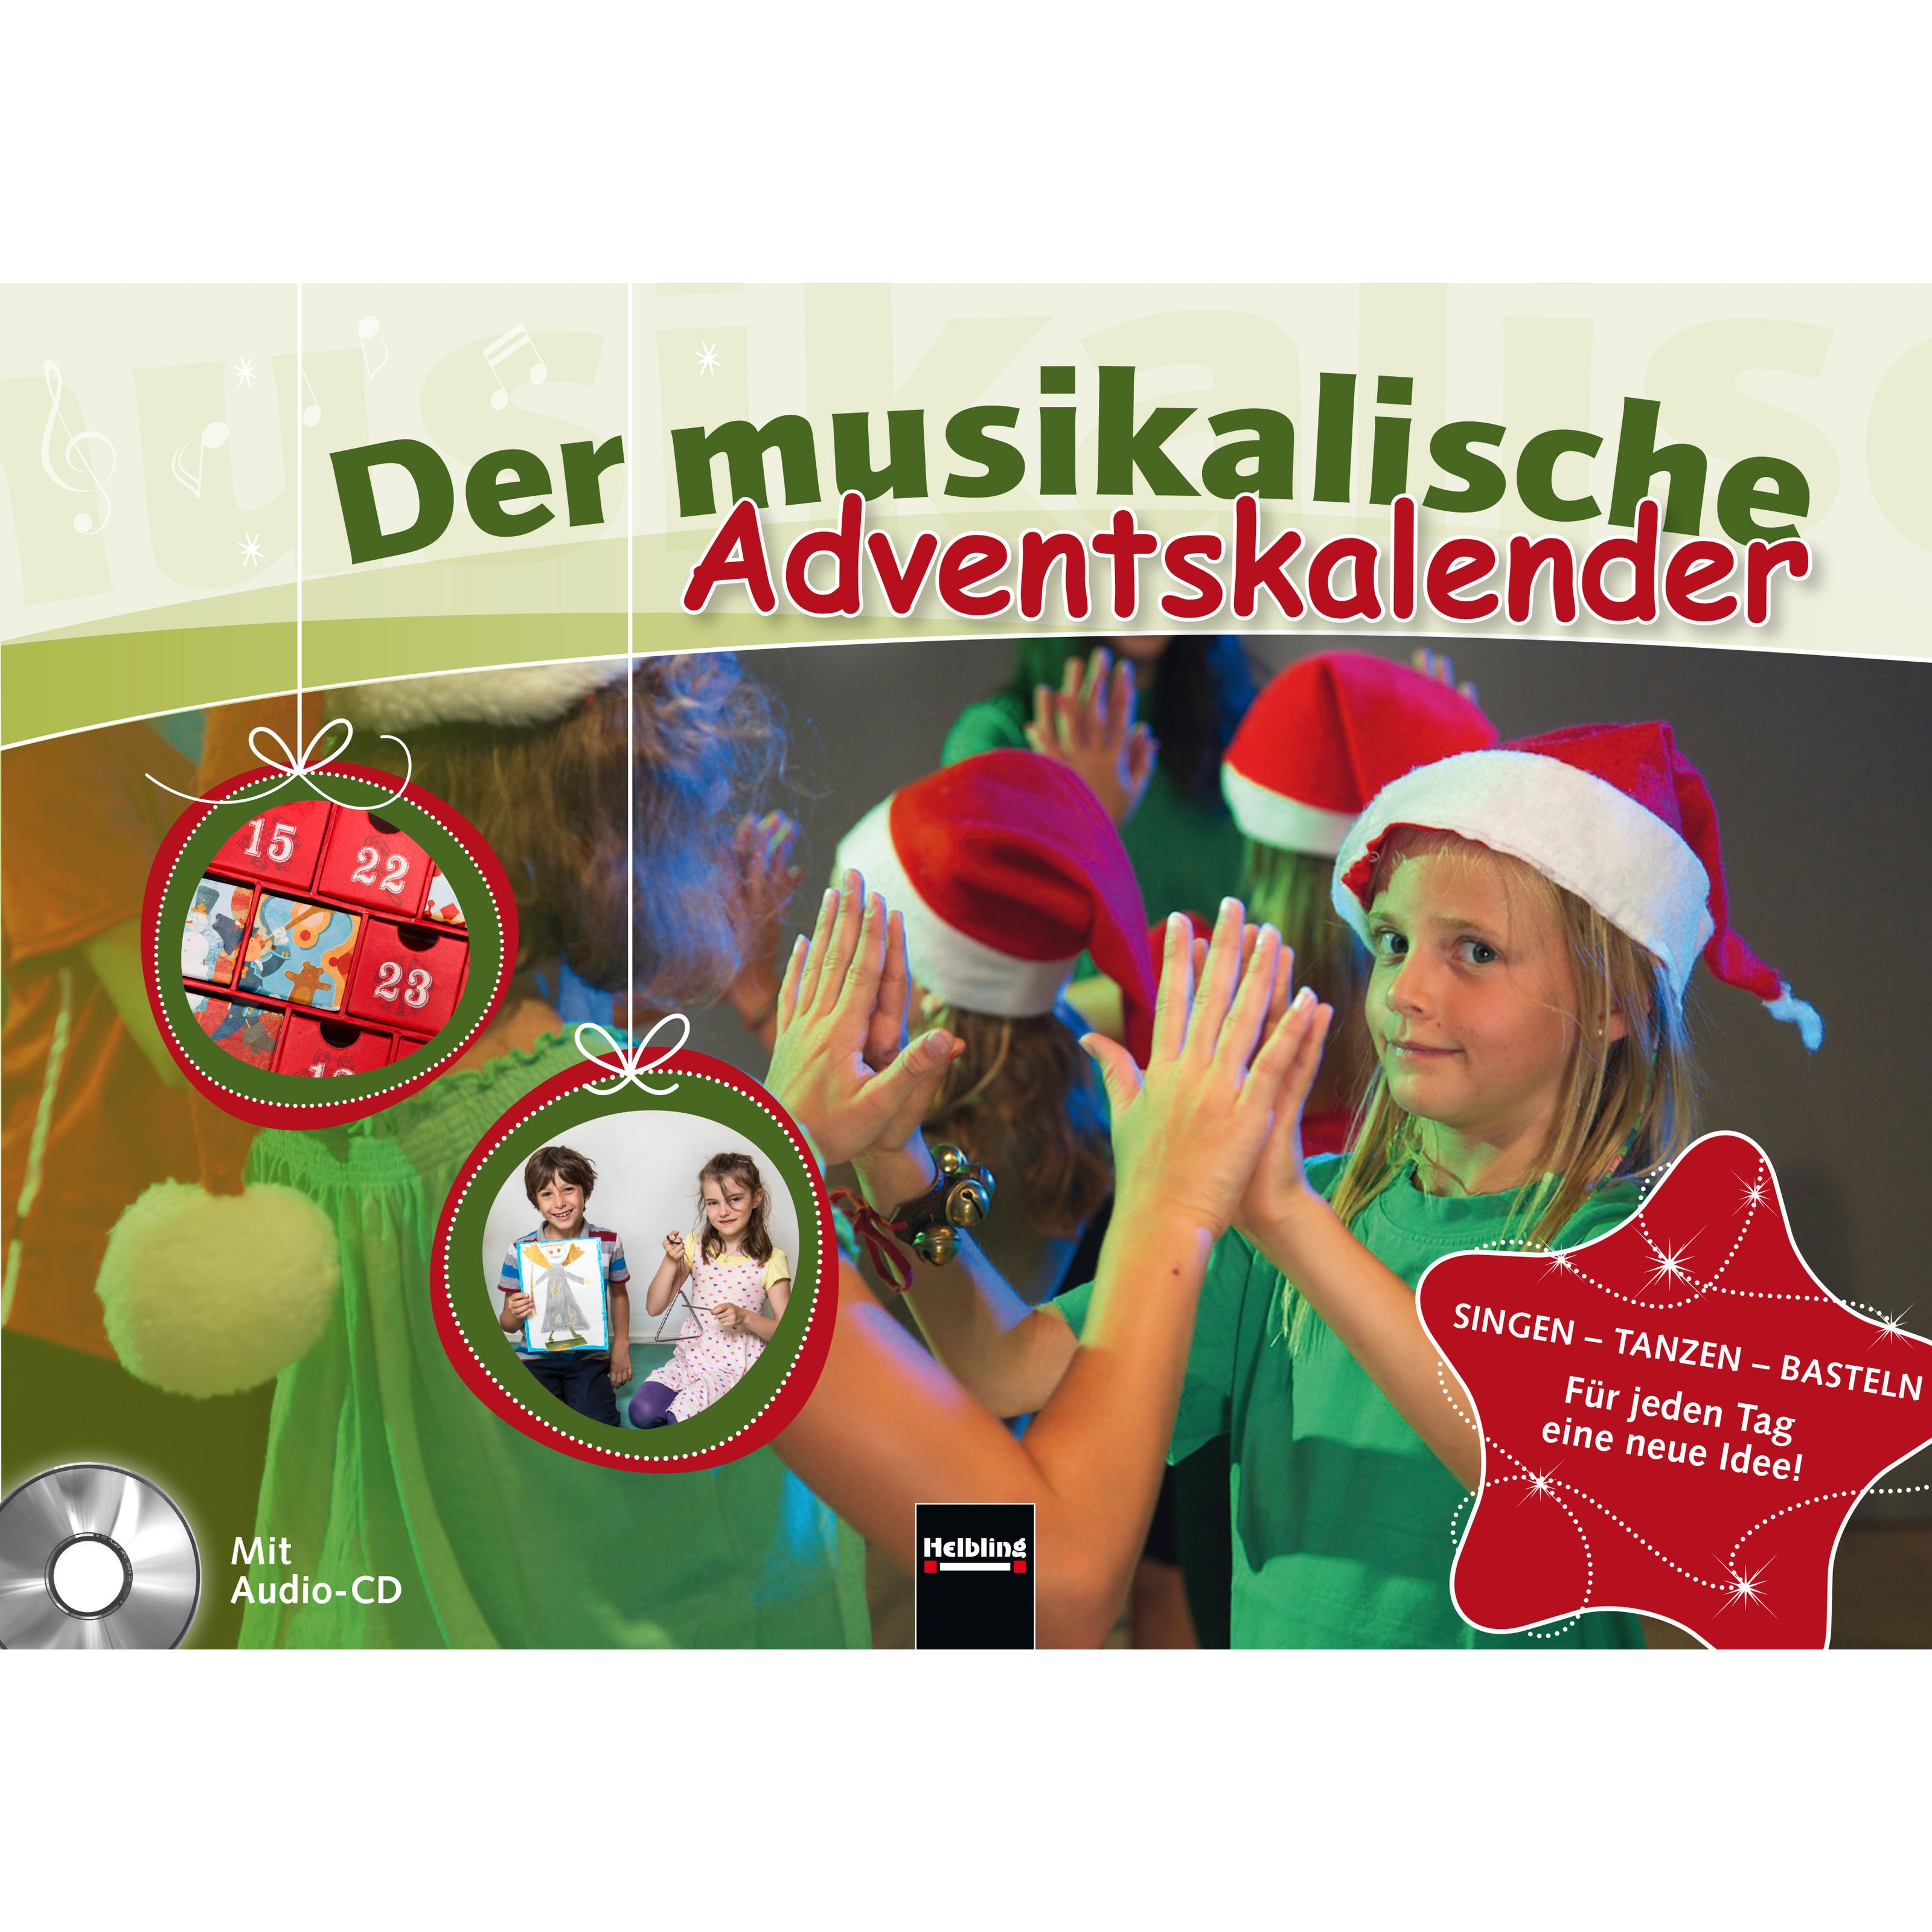 Helbling Verlag - Der musikalische Adventskalender S8050